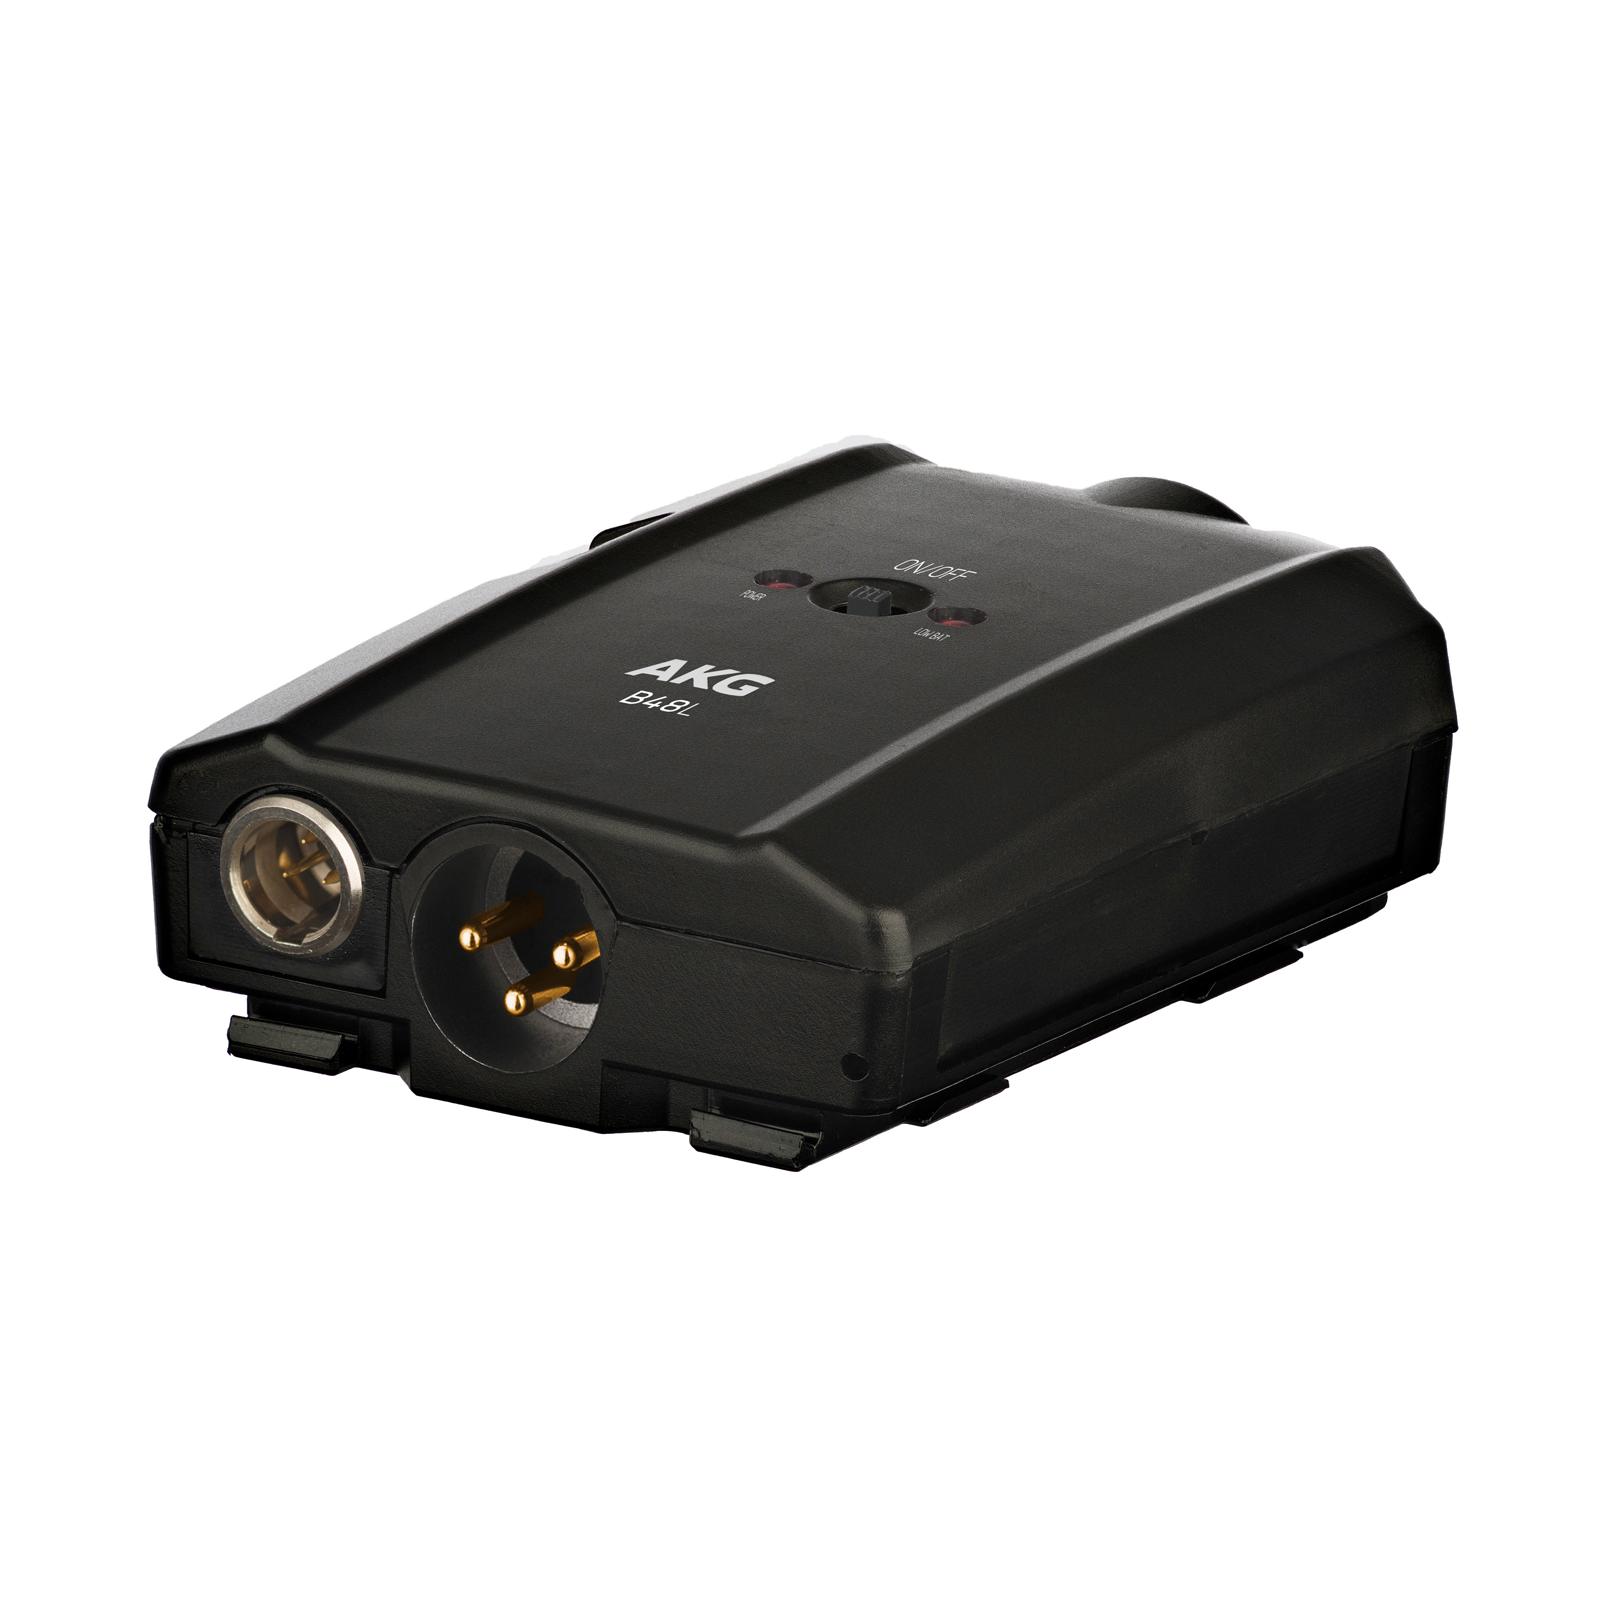 B48 L - Black - Battery-operated phantom power supply - Hero